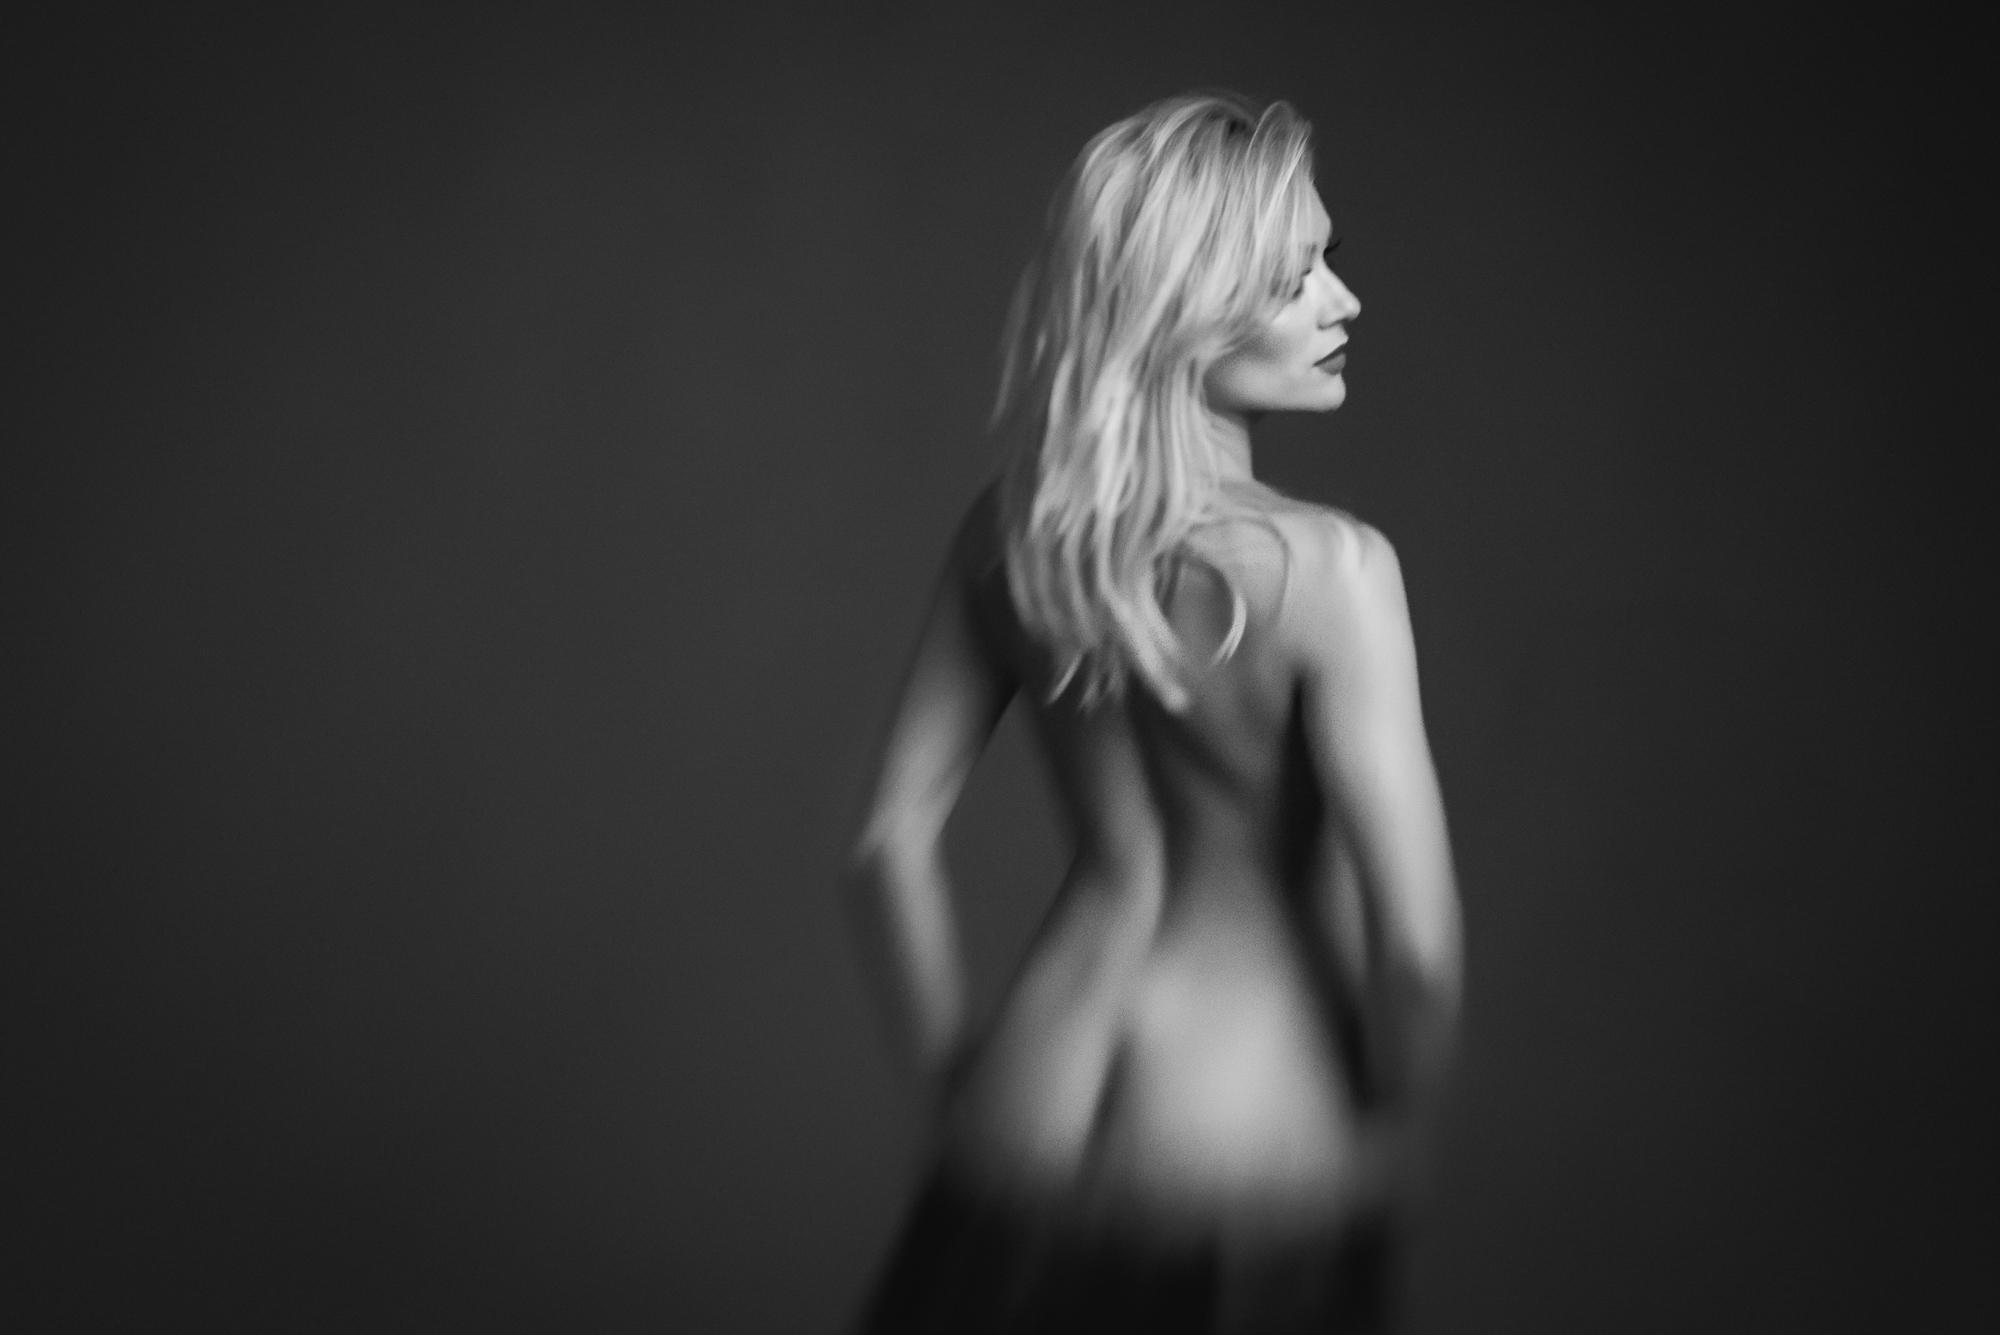 fotograf nud constanta 10b